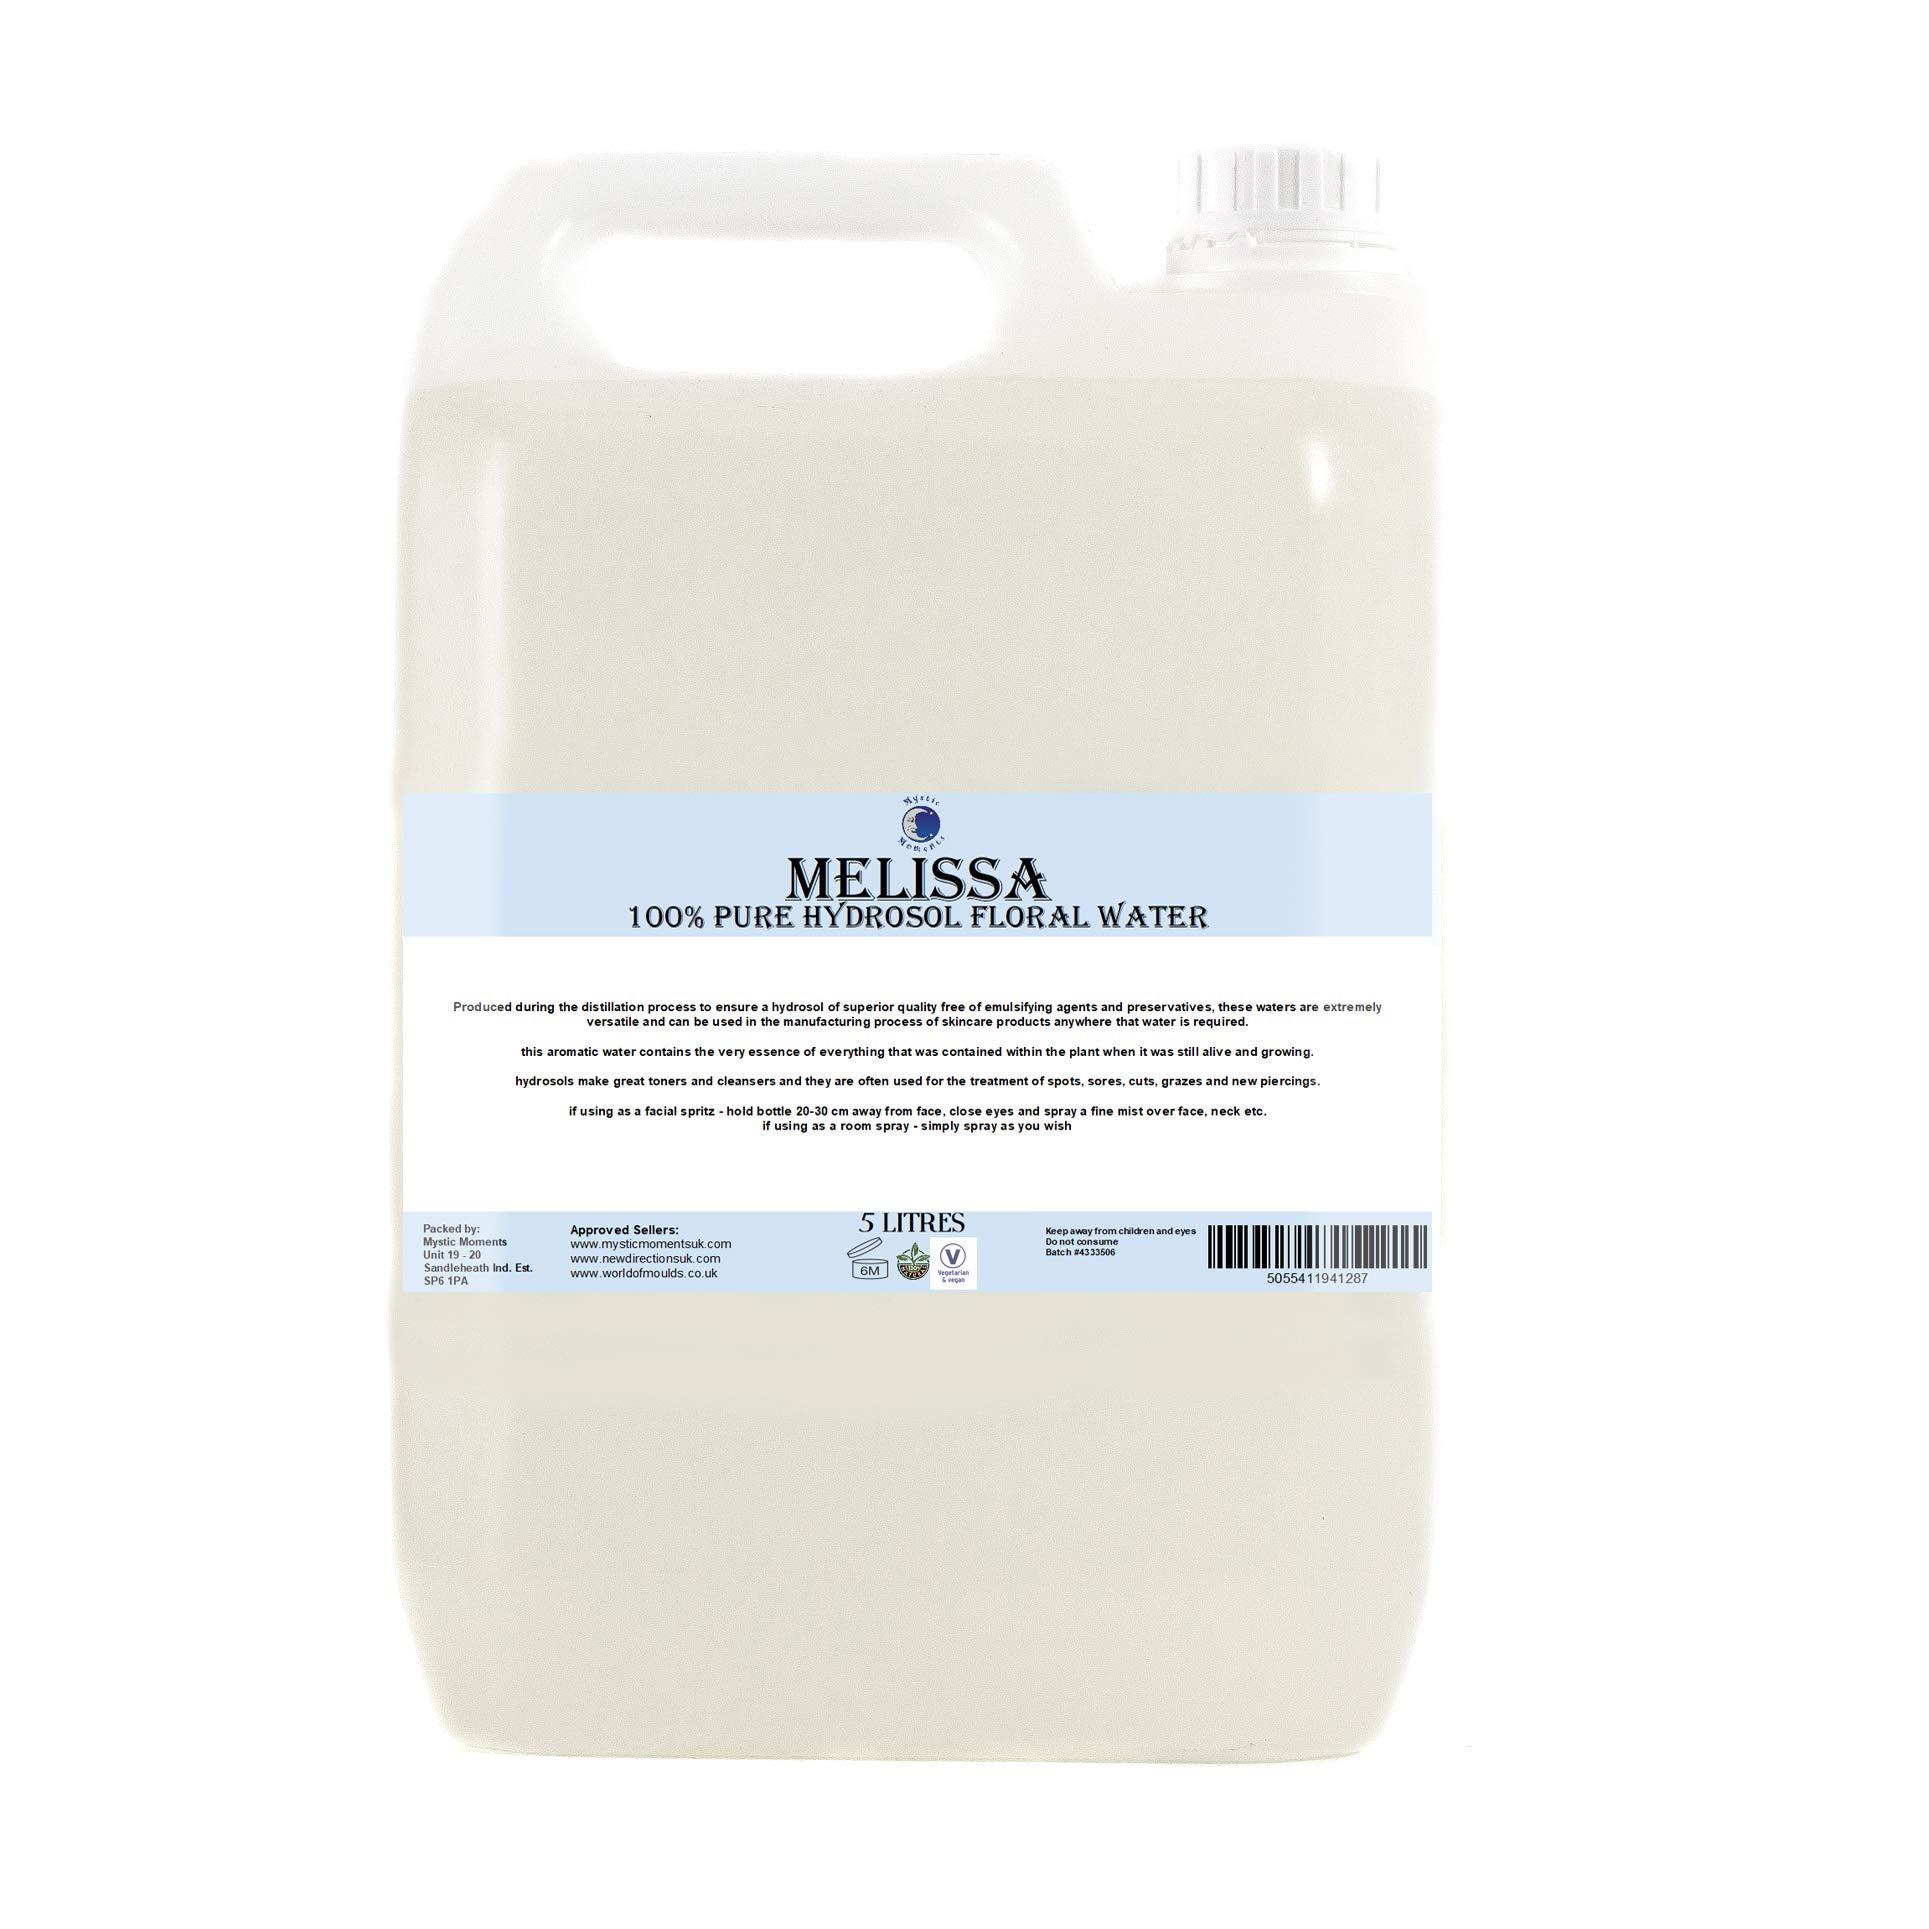 Melissa Hydrosol Floral Water - 5Kg